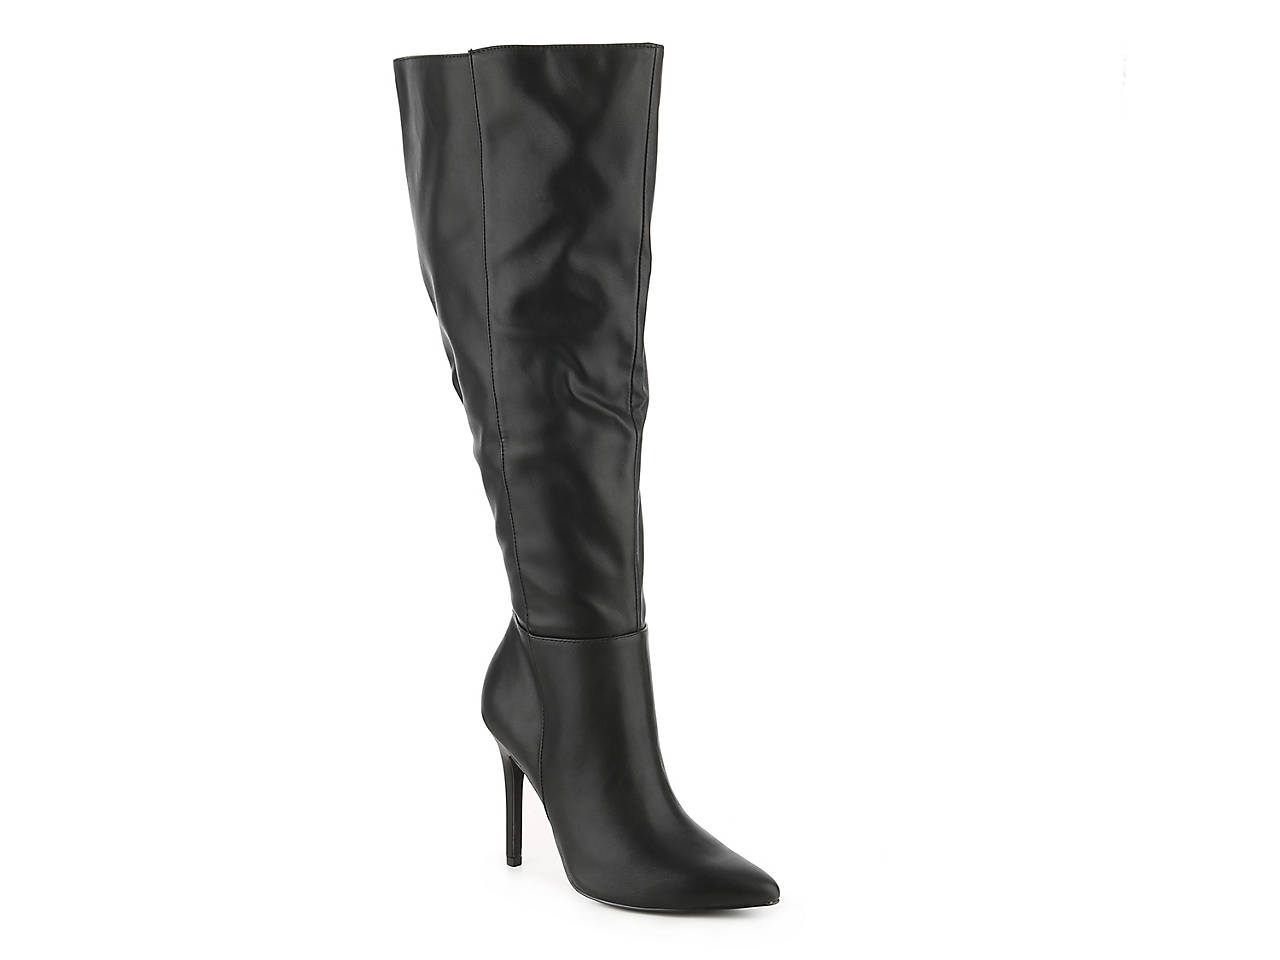 7c8b35df0867 Charles by Charles David Daya Wide Calf Boot Women s Shoes